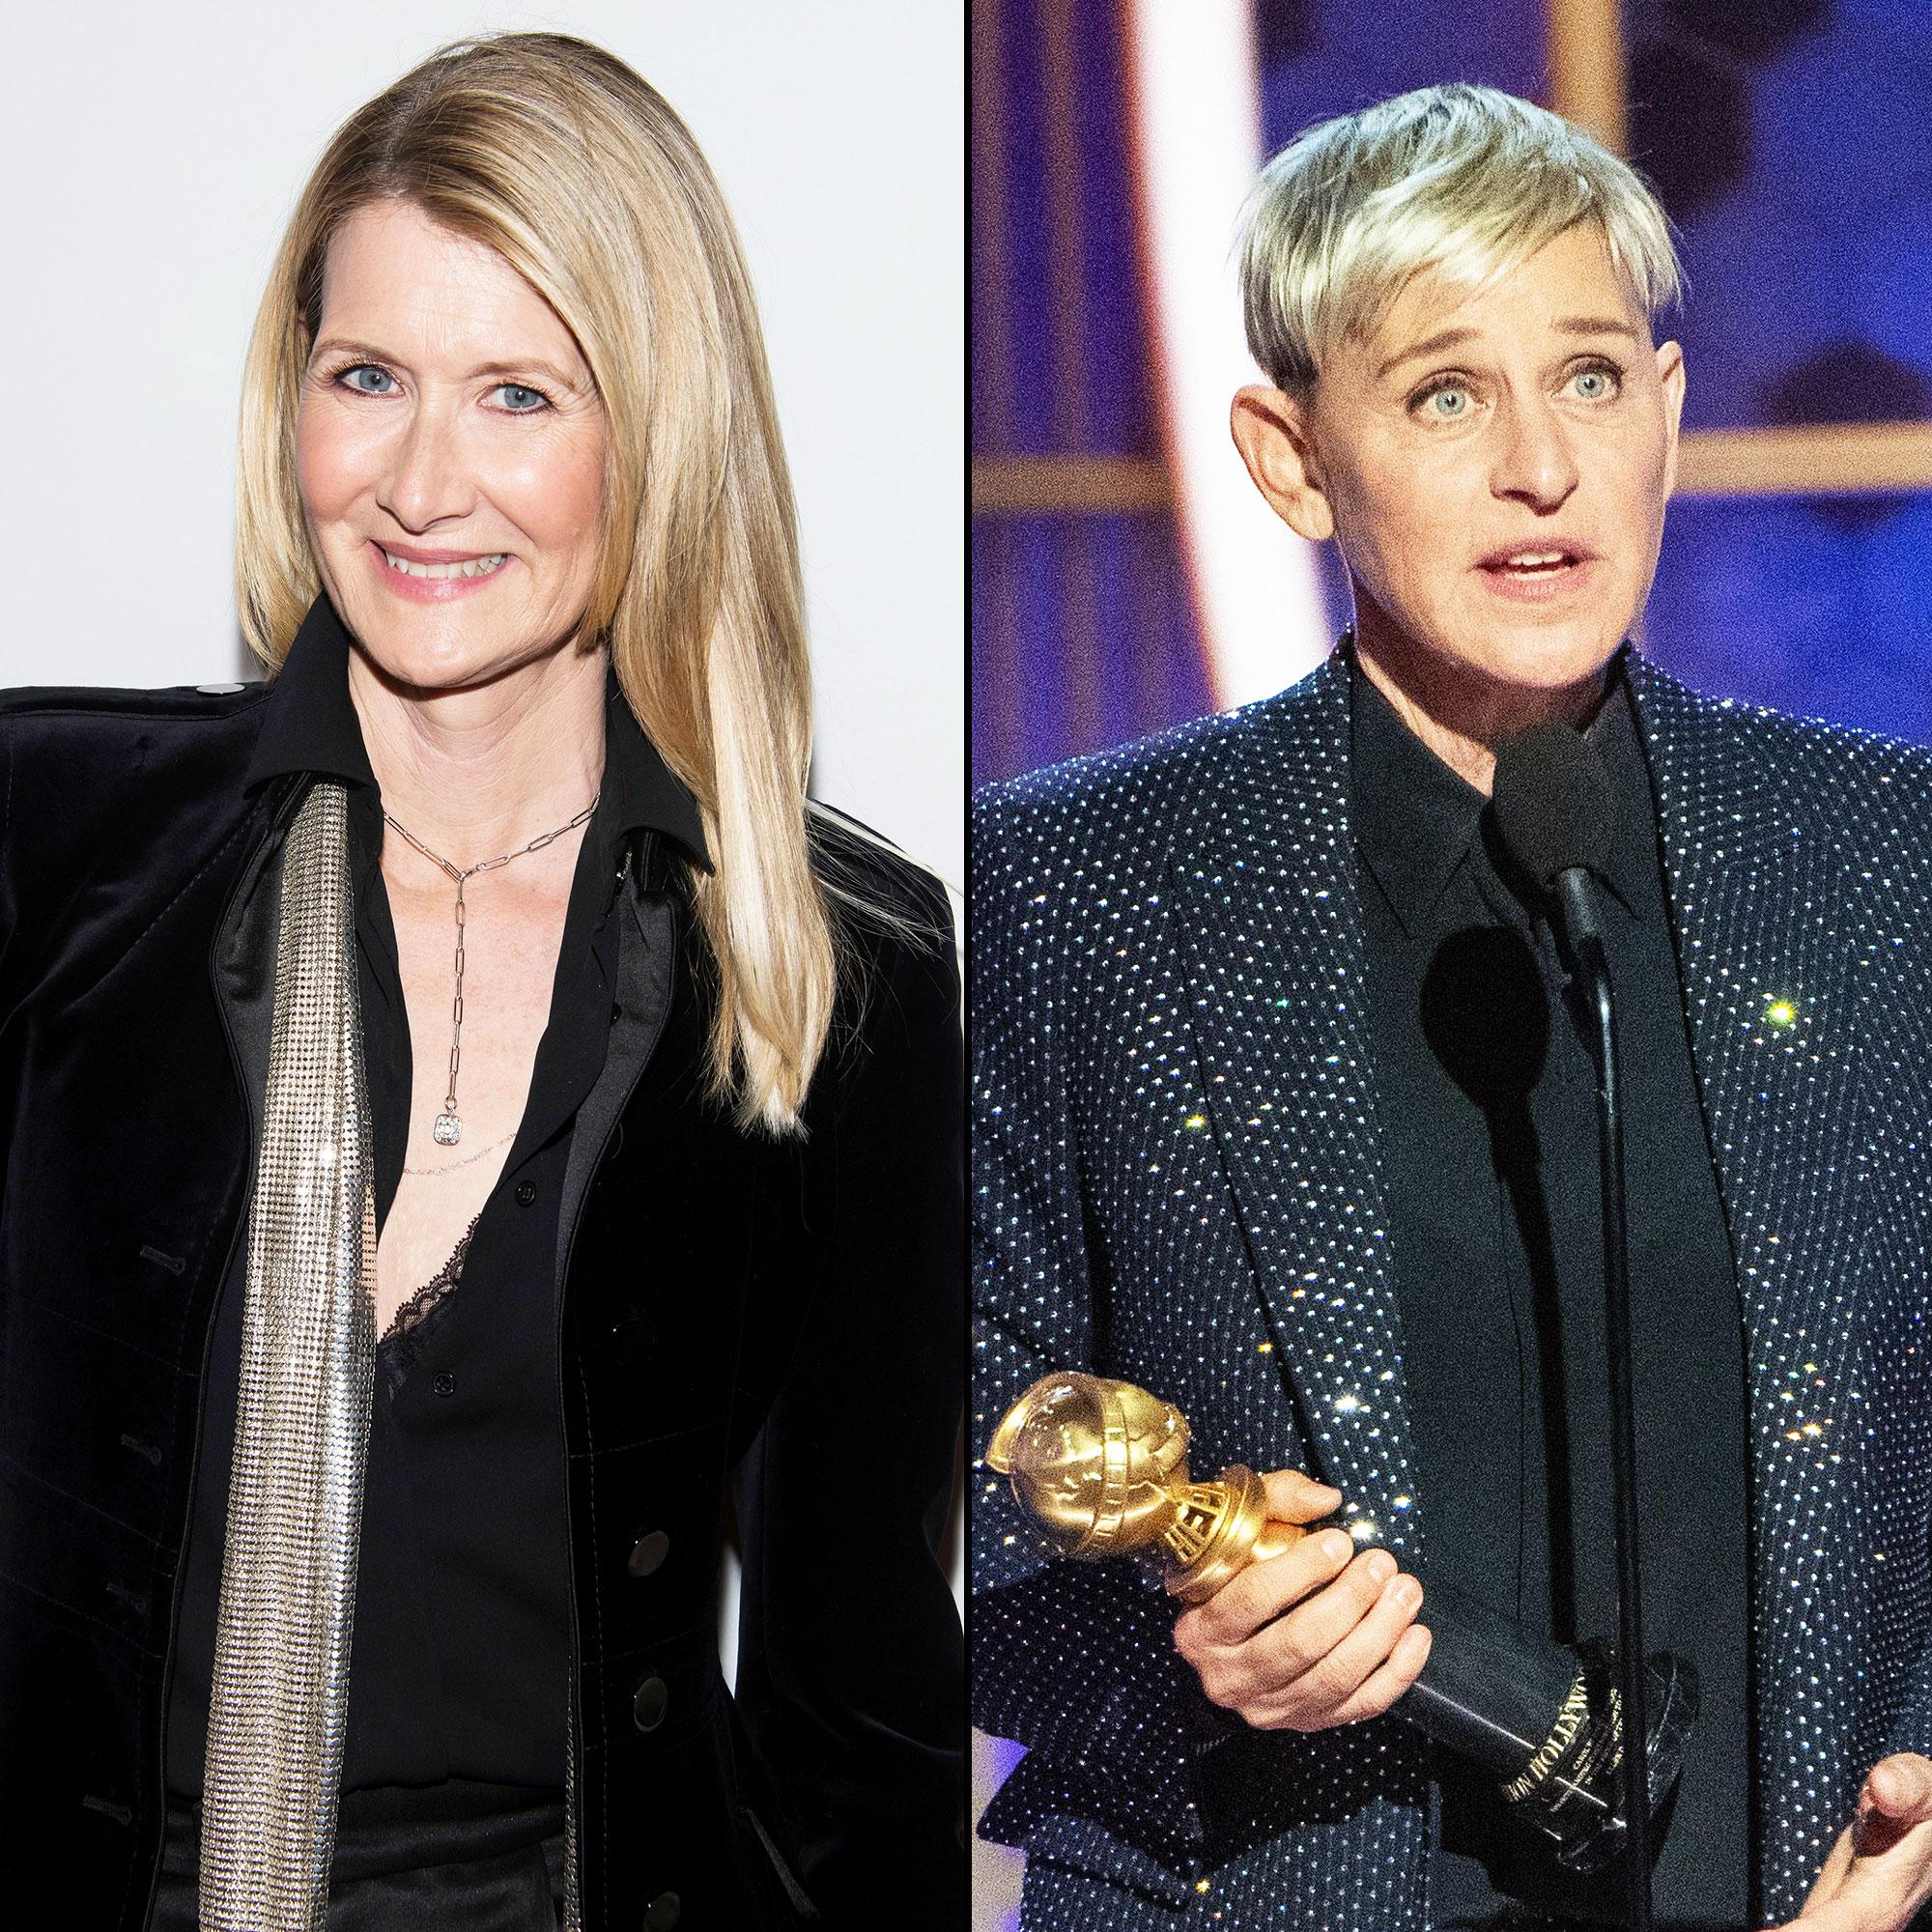 Laura Dern reveals why she cried during Ellen Degeneres Golden Globes acceptance speech